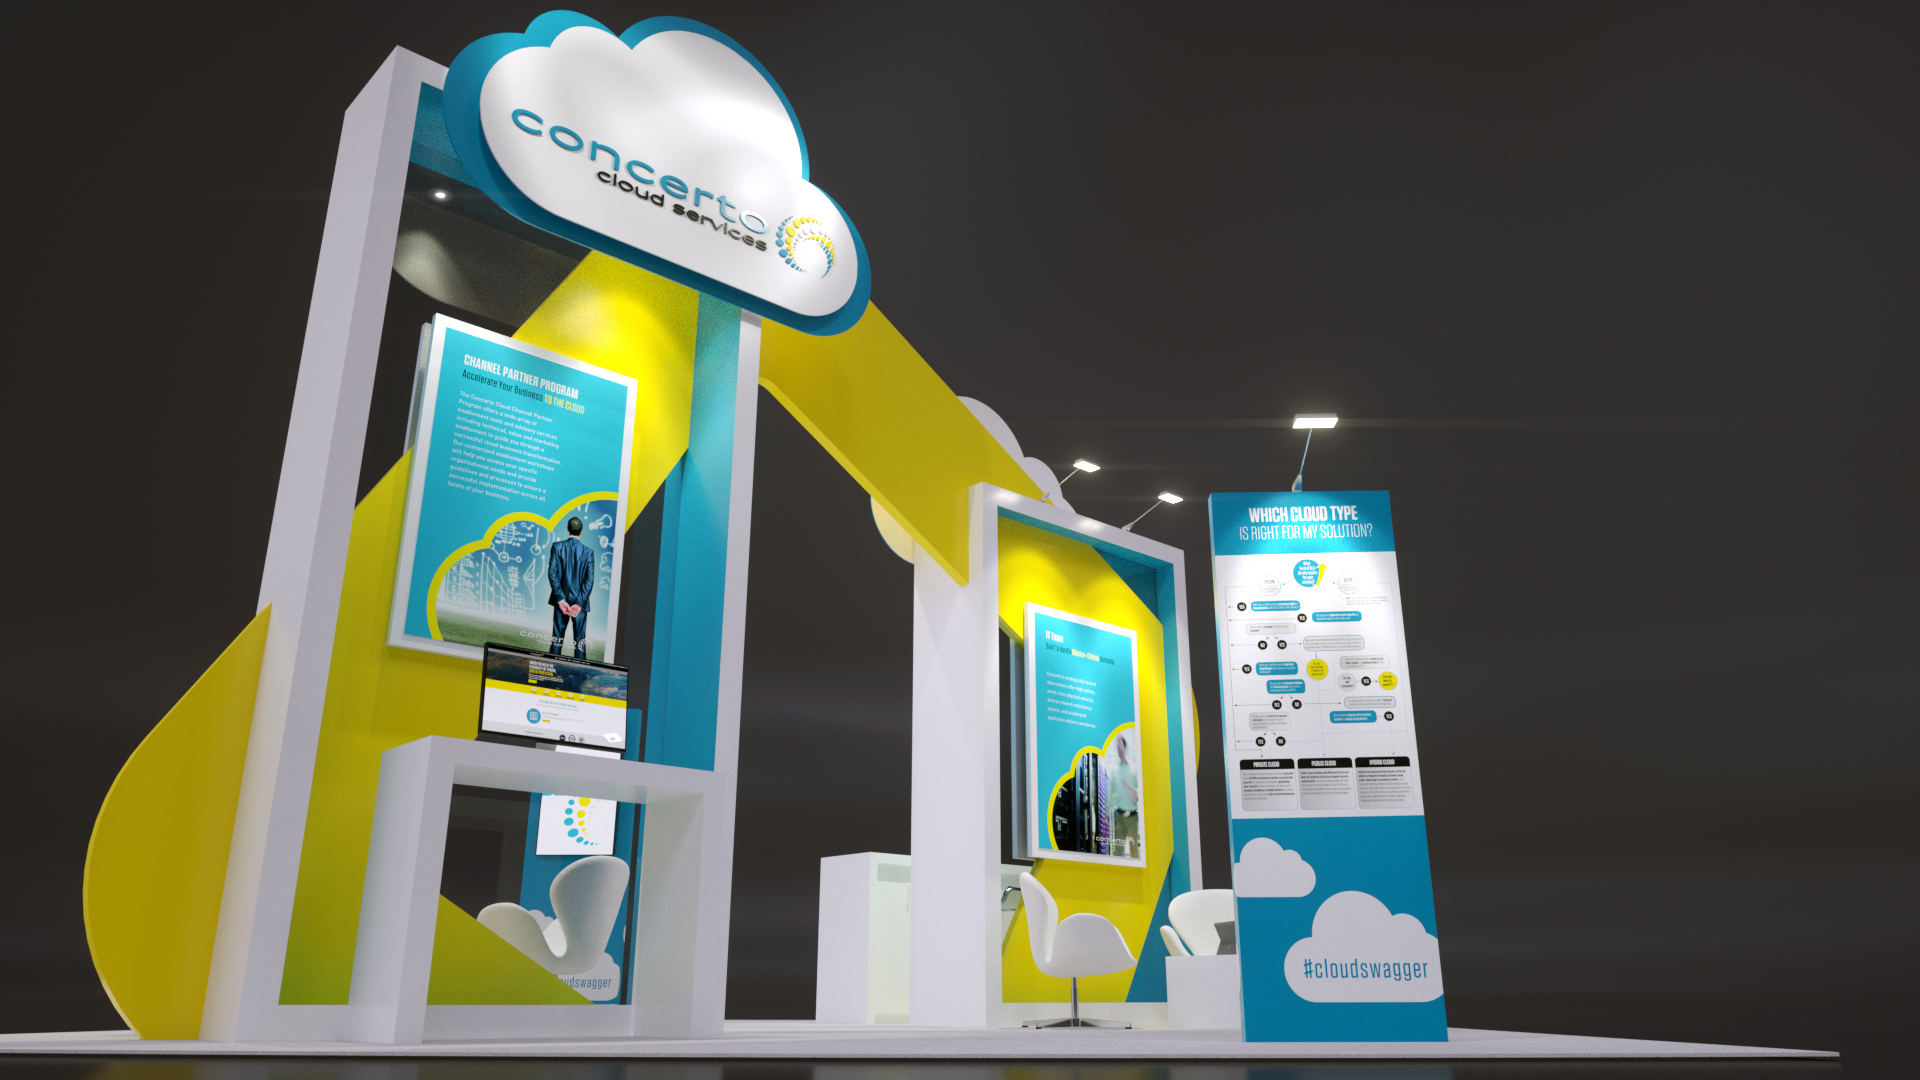 3053 - Concerto Cloud Services - Microsoft Envision 2016 - View 14.jpg